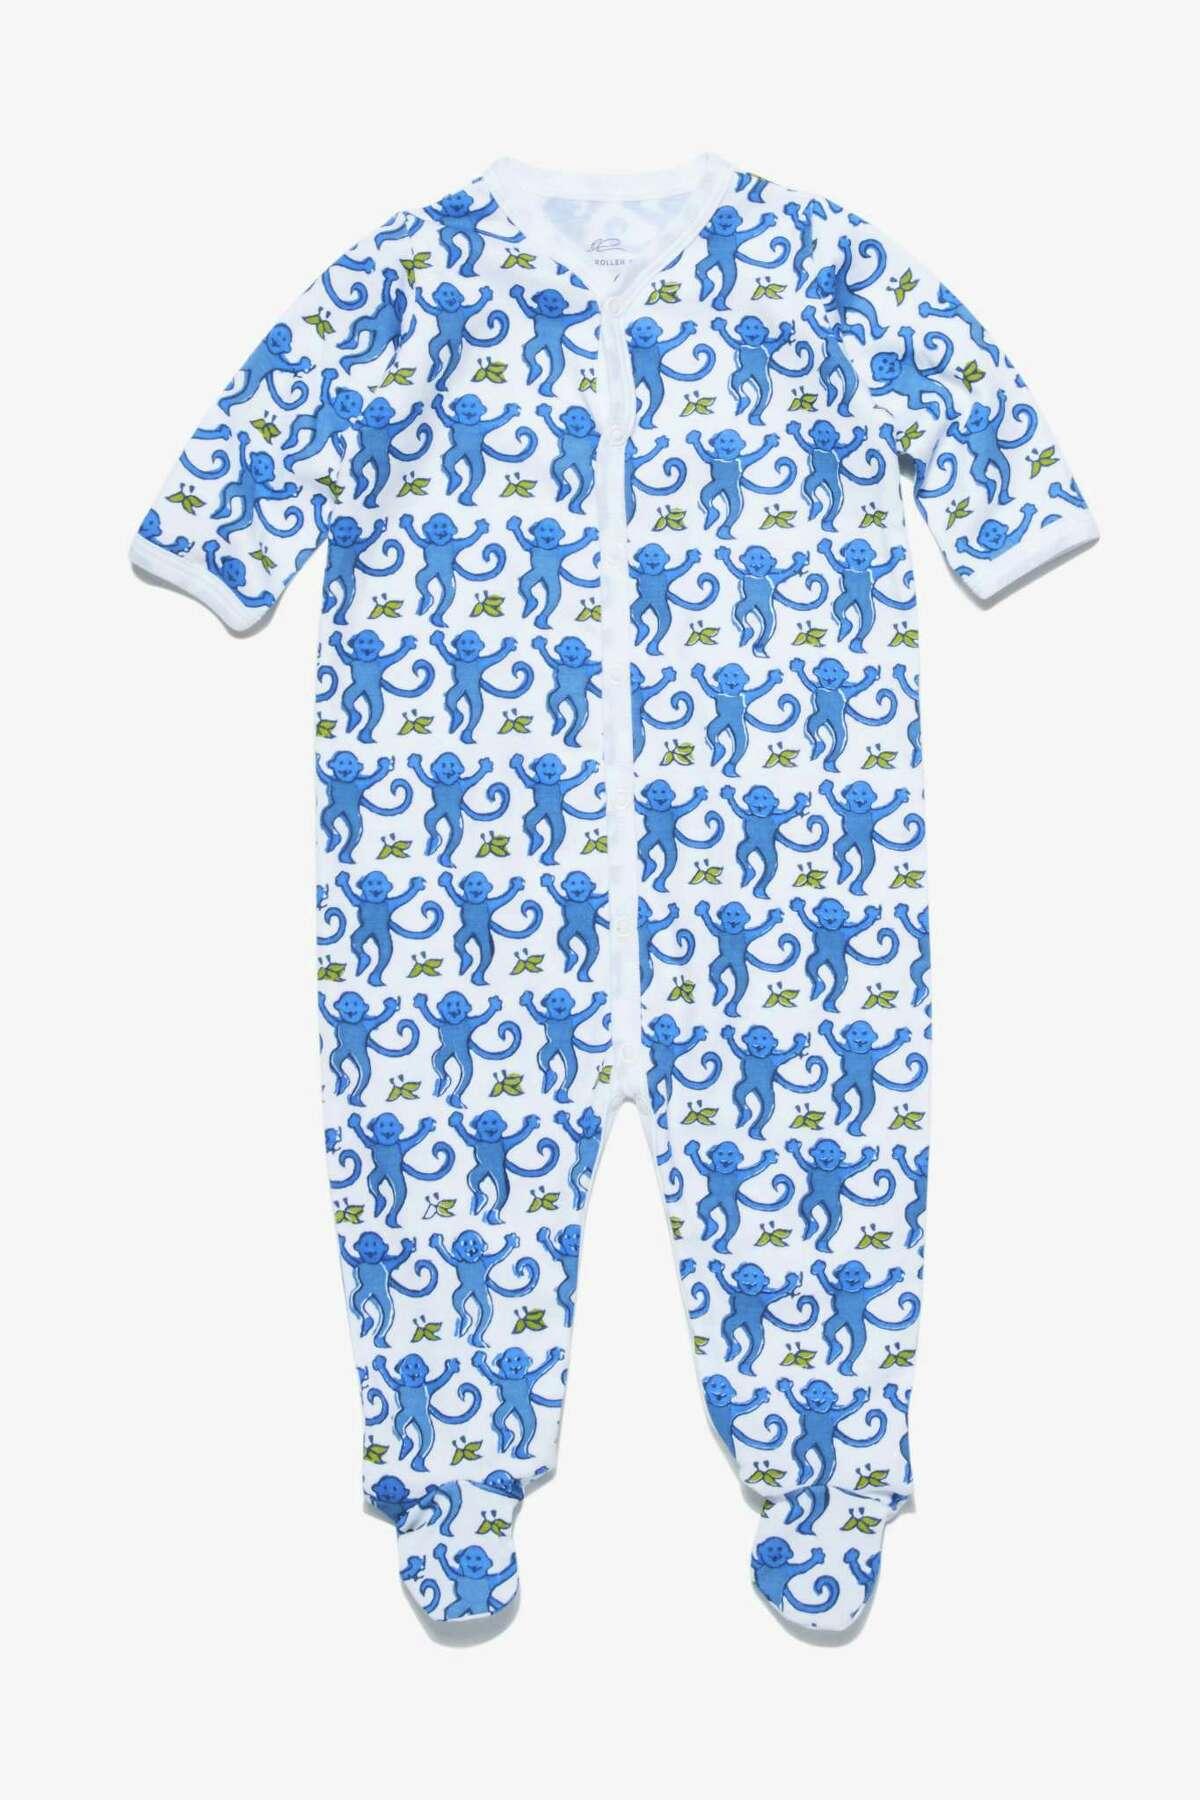 Hand-blocked monkey print infant snap suit; $55 at Roller Rabbit, River Oaks District